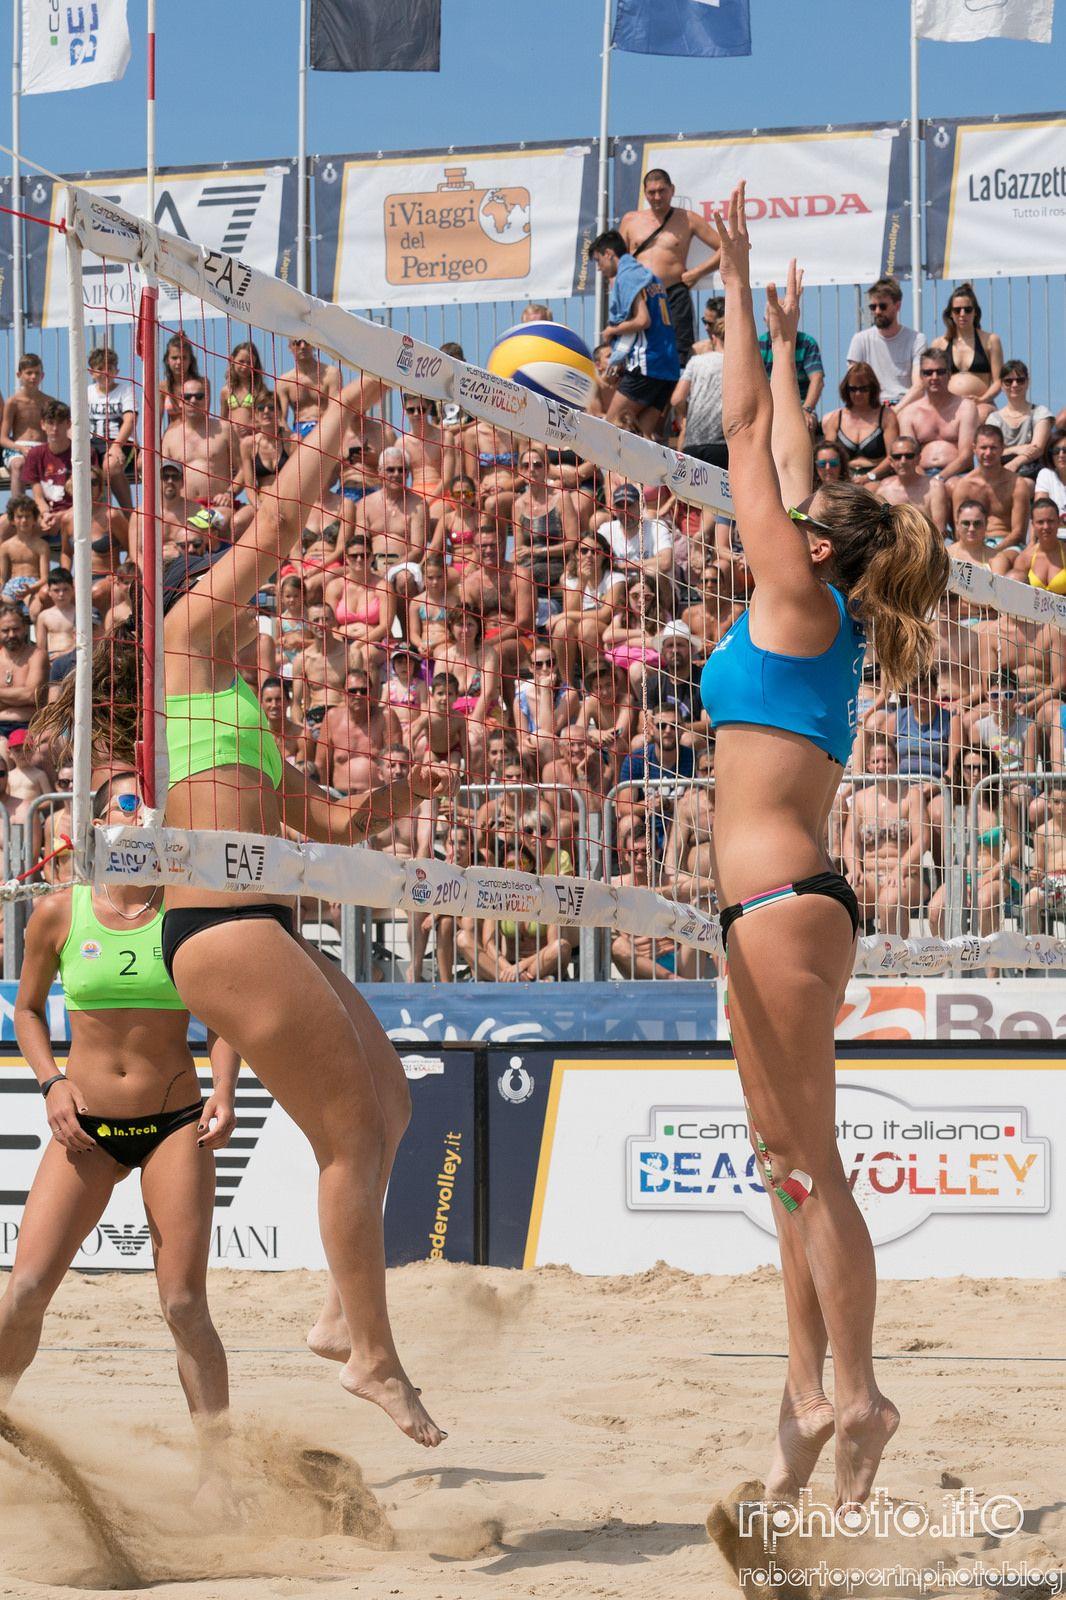 2 Tappa Campionato Italiano Beach Volley Olympic Volleyball Beach Volleyball Olympic Gymnastics